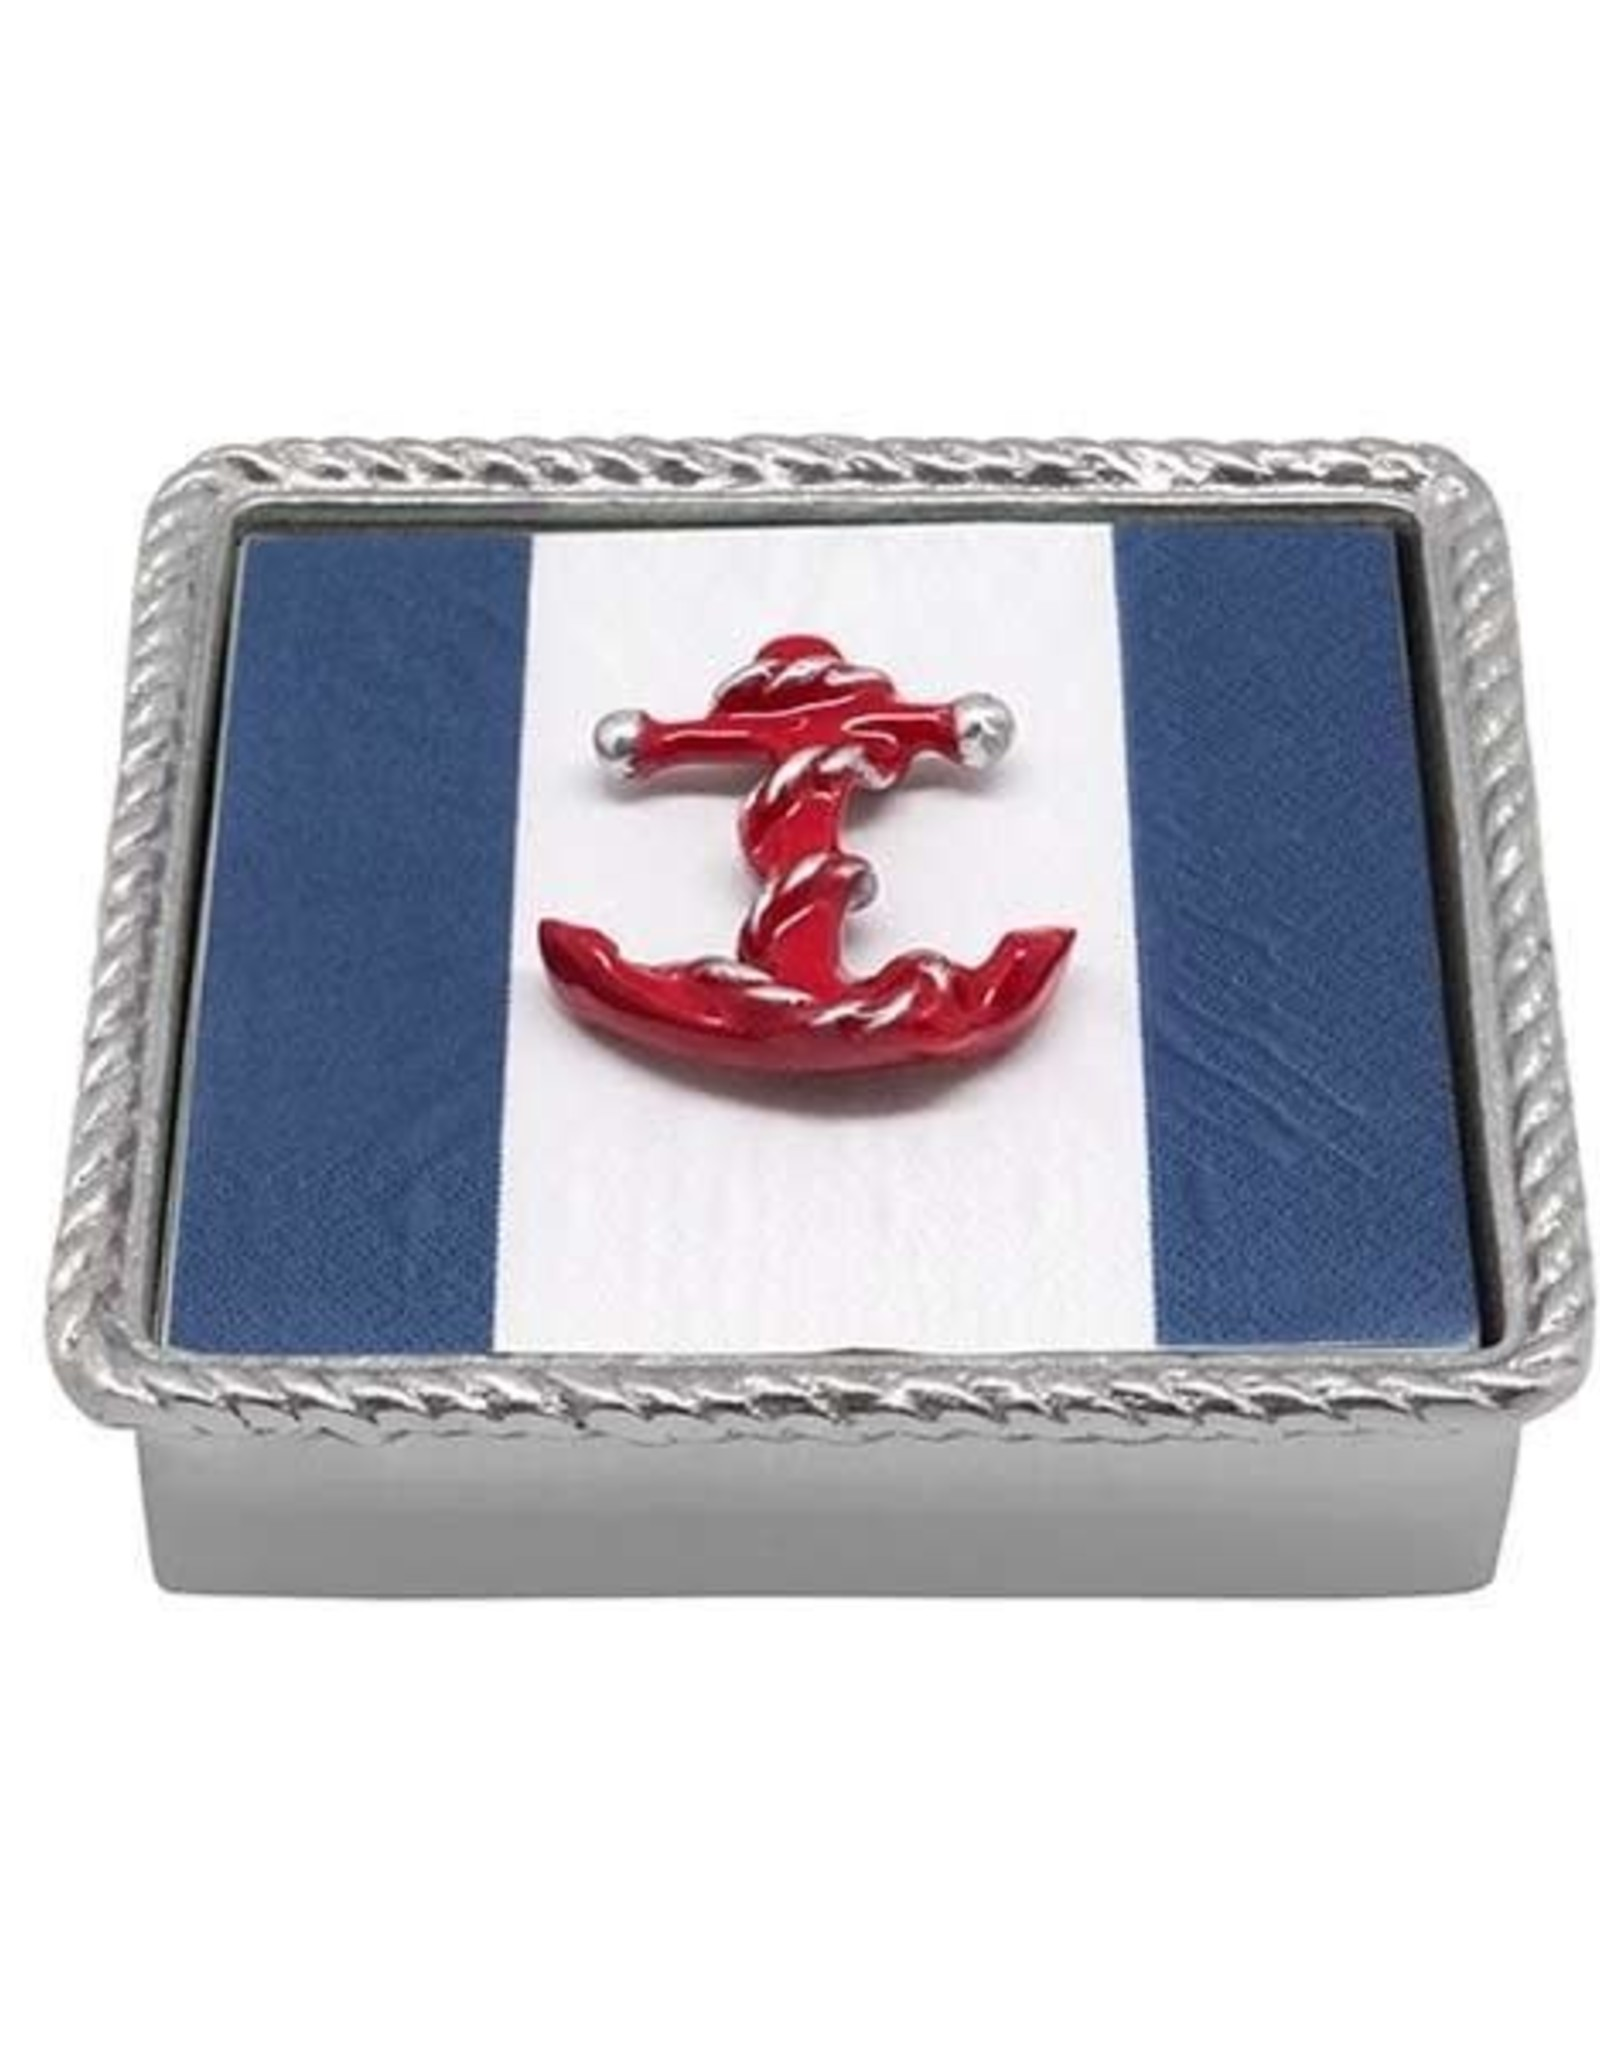 Napkin Box - Red Anchor Rope